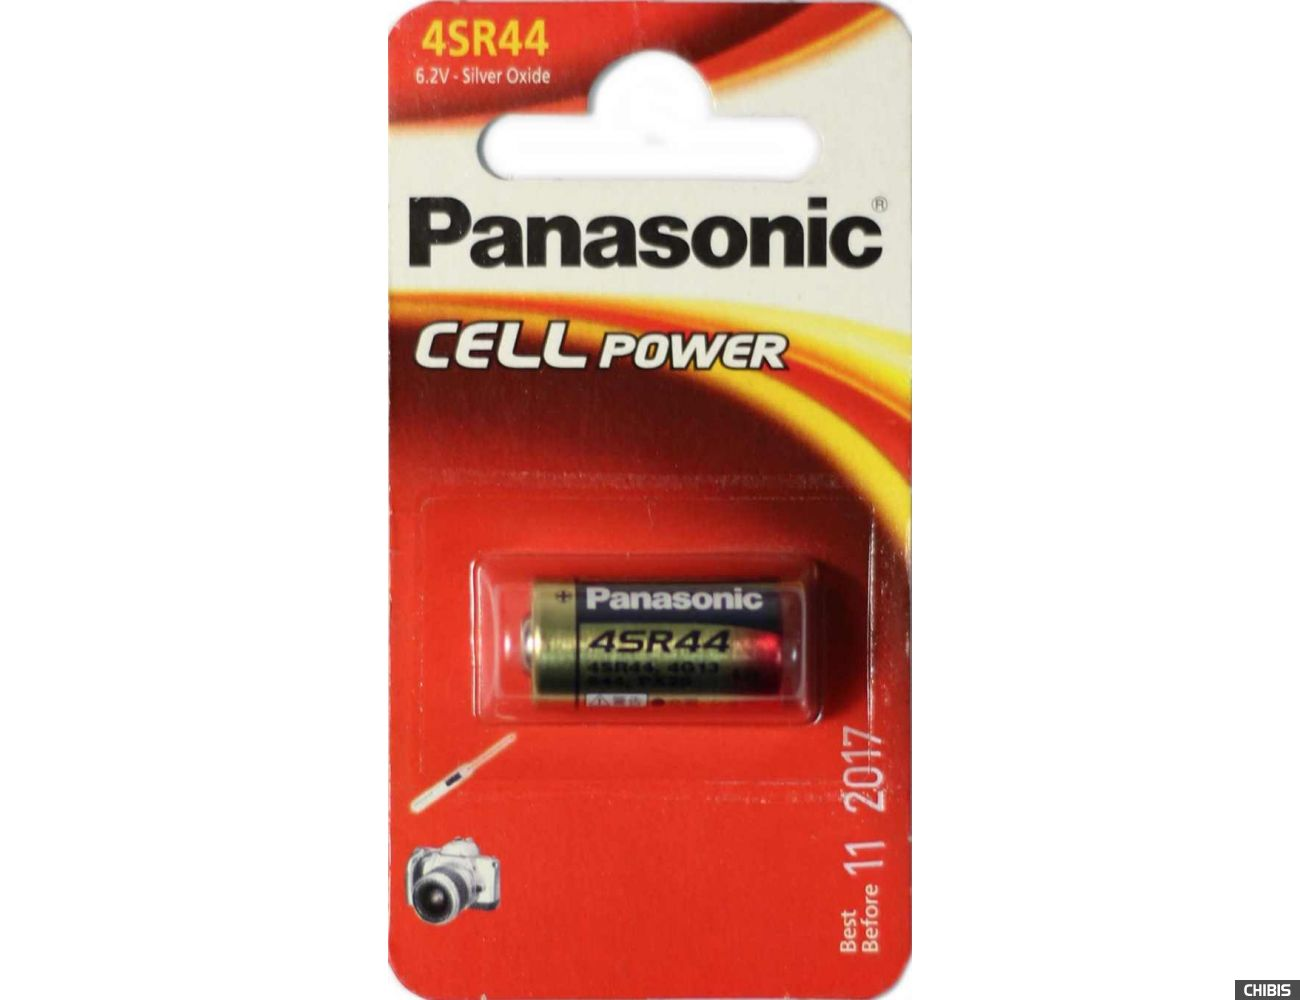 Батарейка Panasonic 4SR 44EL 6.2V блистер 1 шт (4LR44)